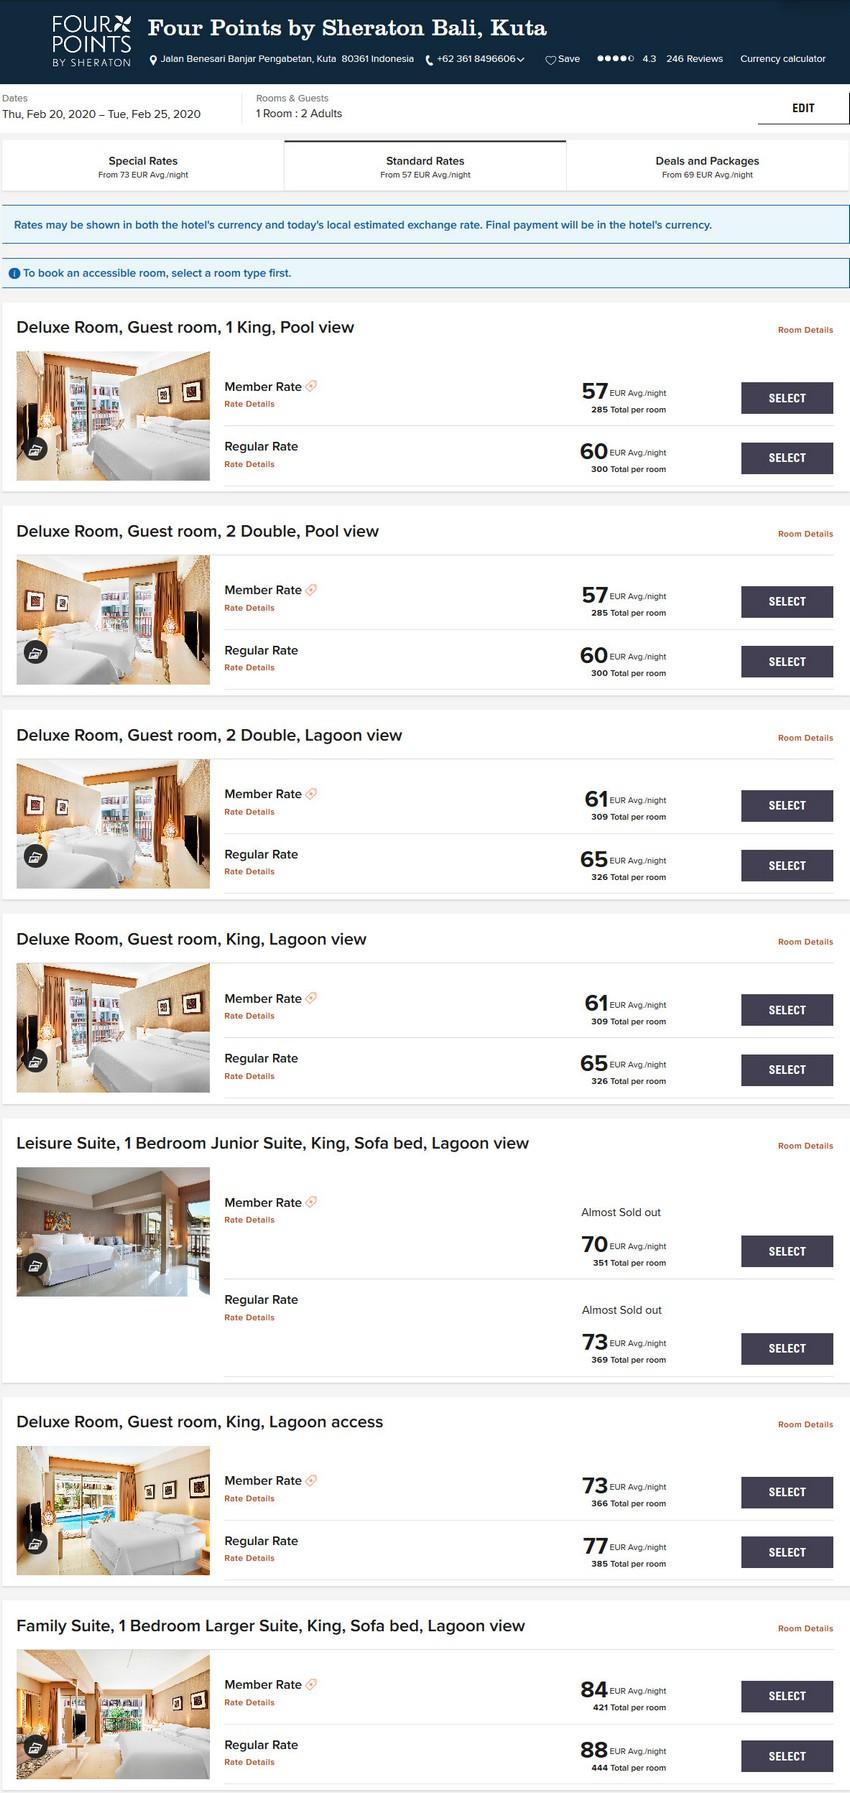 Vergleich Marriott Bonvoy Epic Stay Raten Four Points Bali